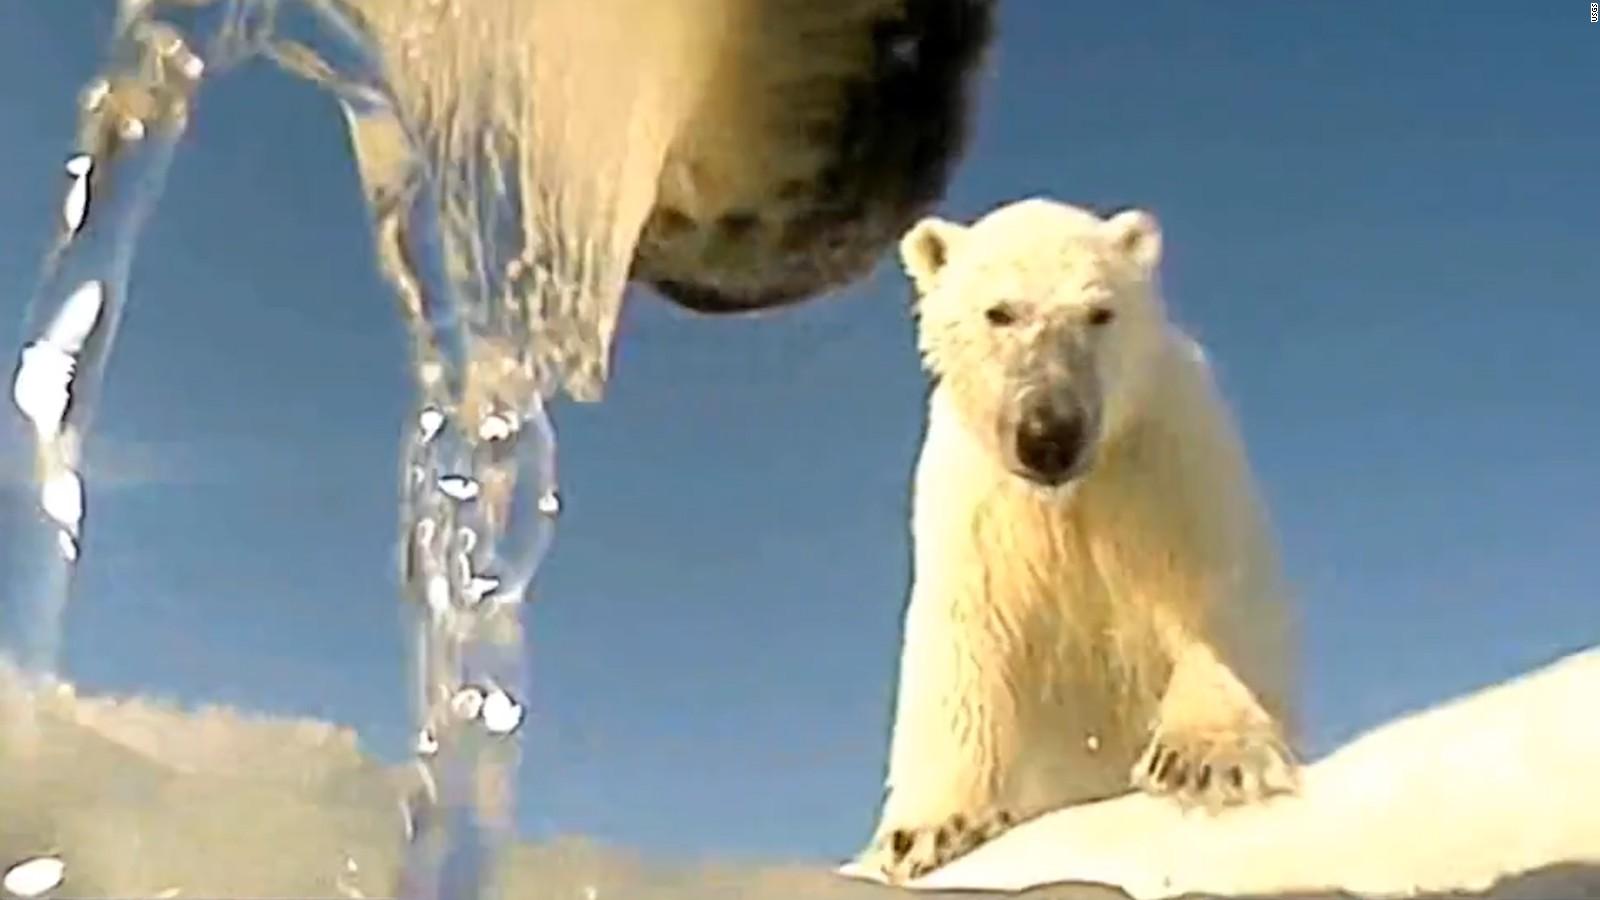 a polar bear view of the world cnn video